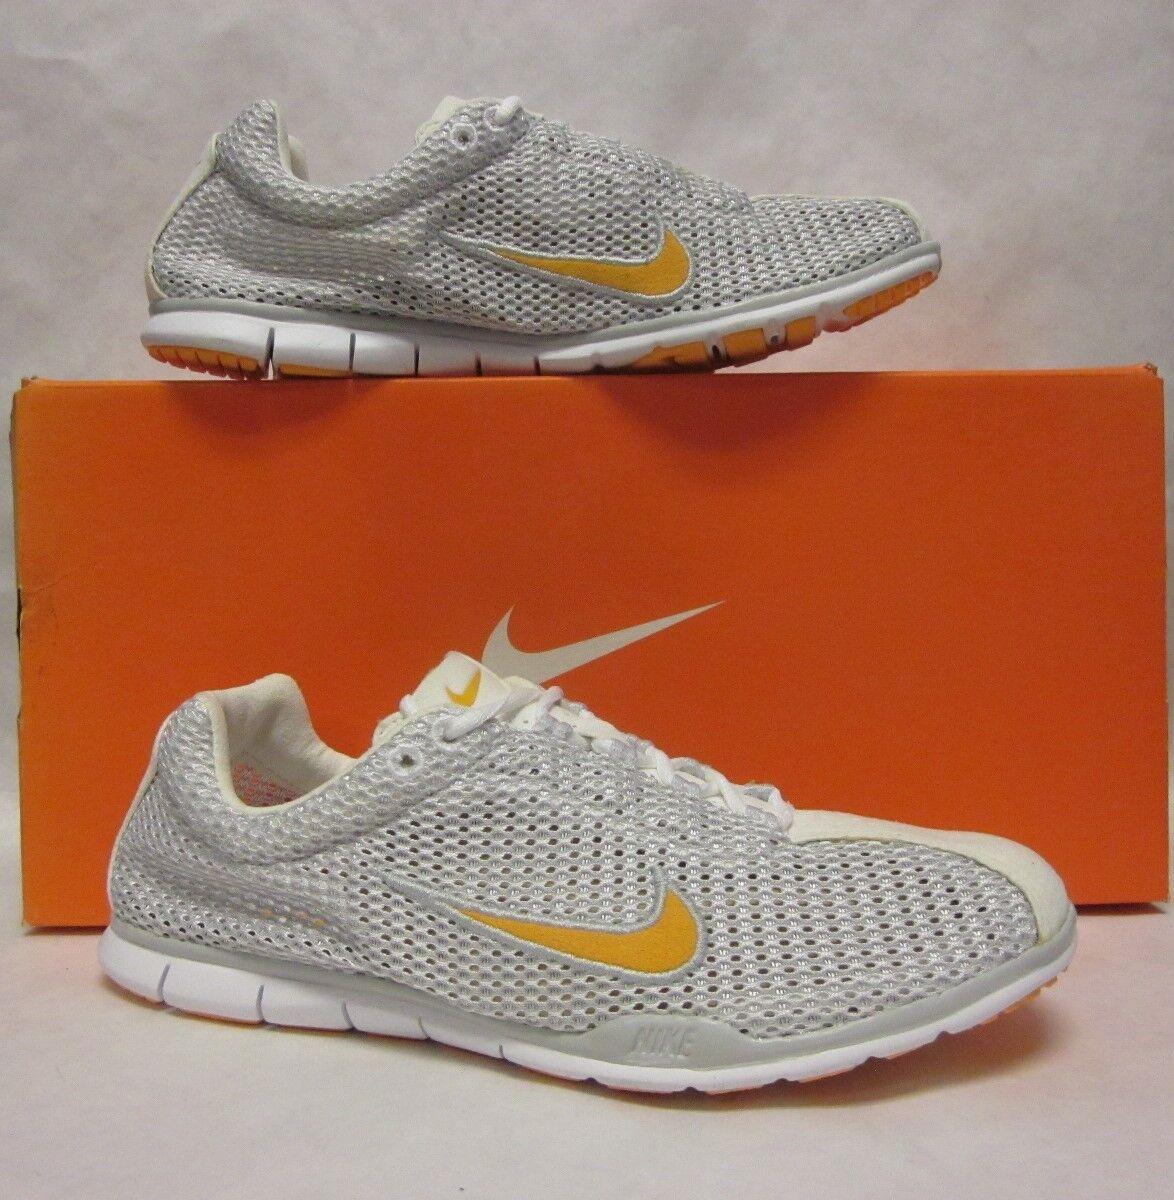 Nike Womens Dayfly White Grey Orange Sneaker - size 6